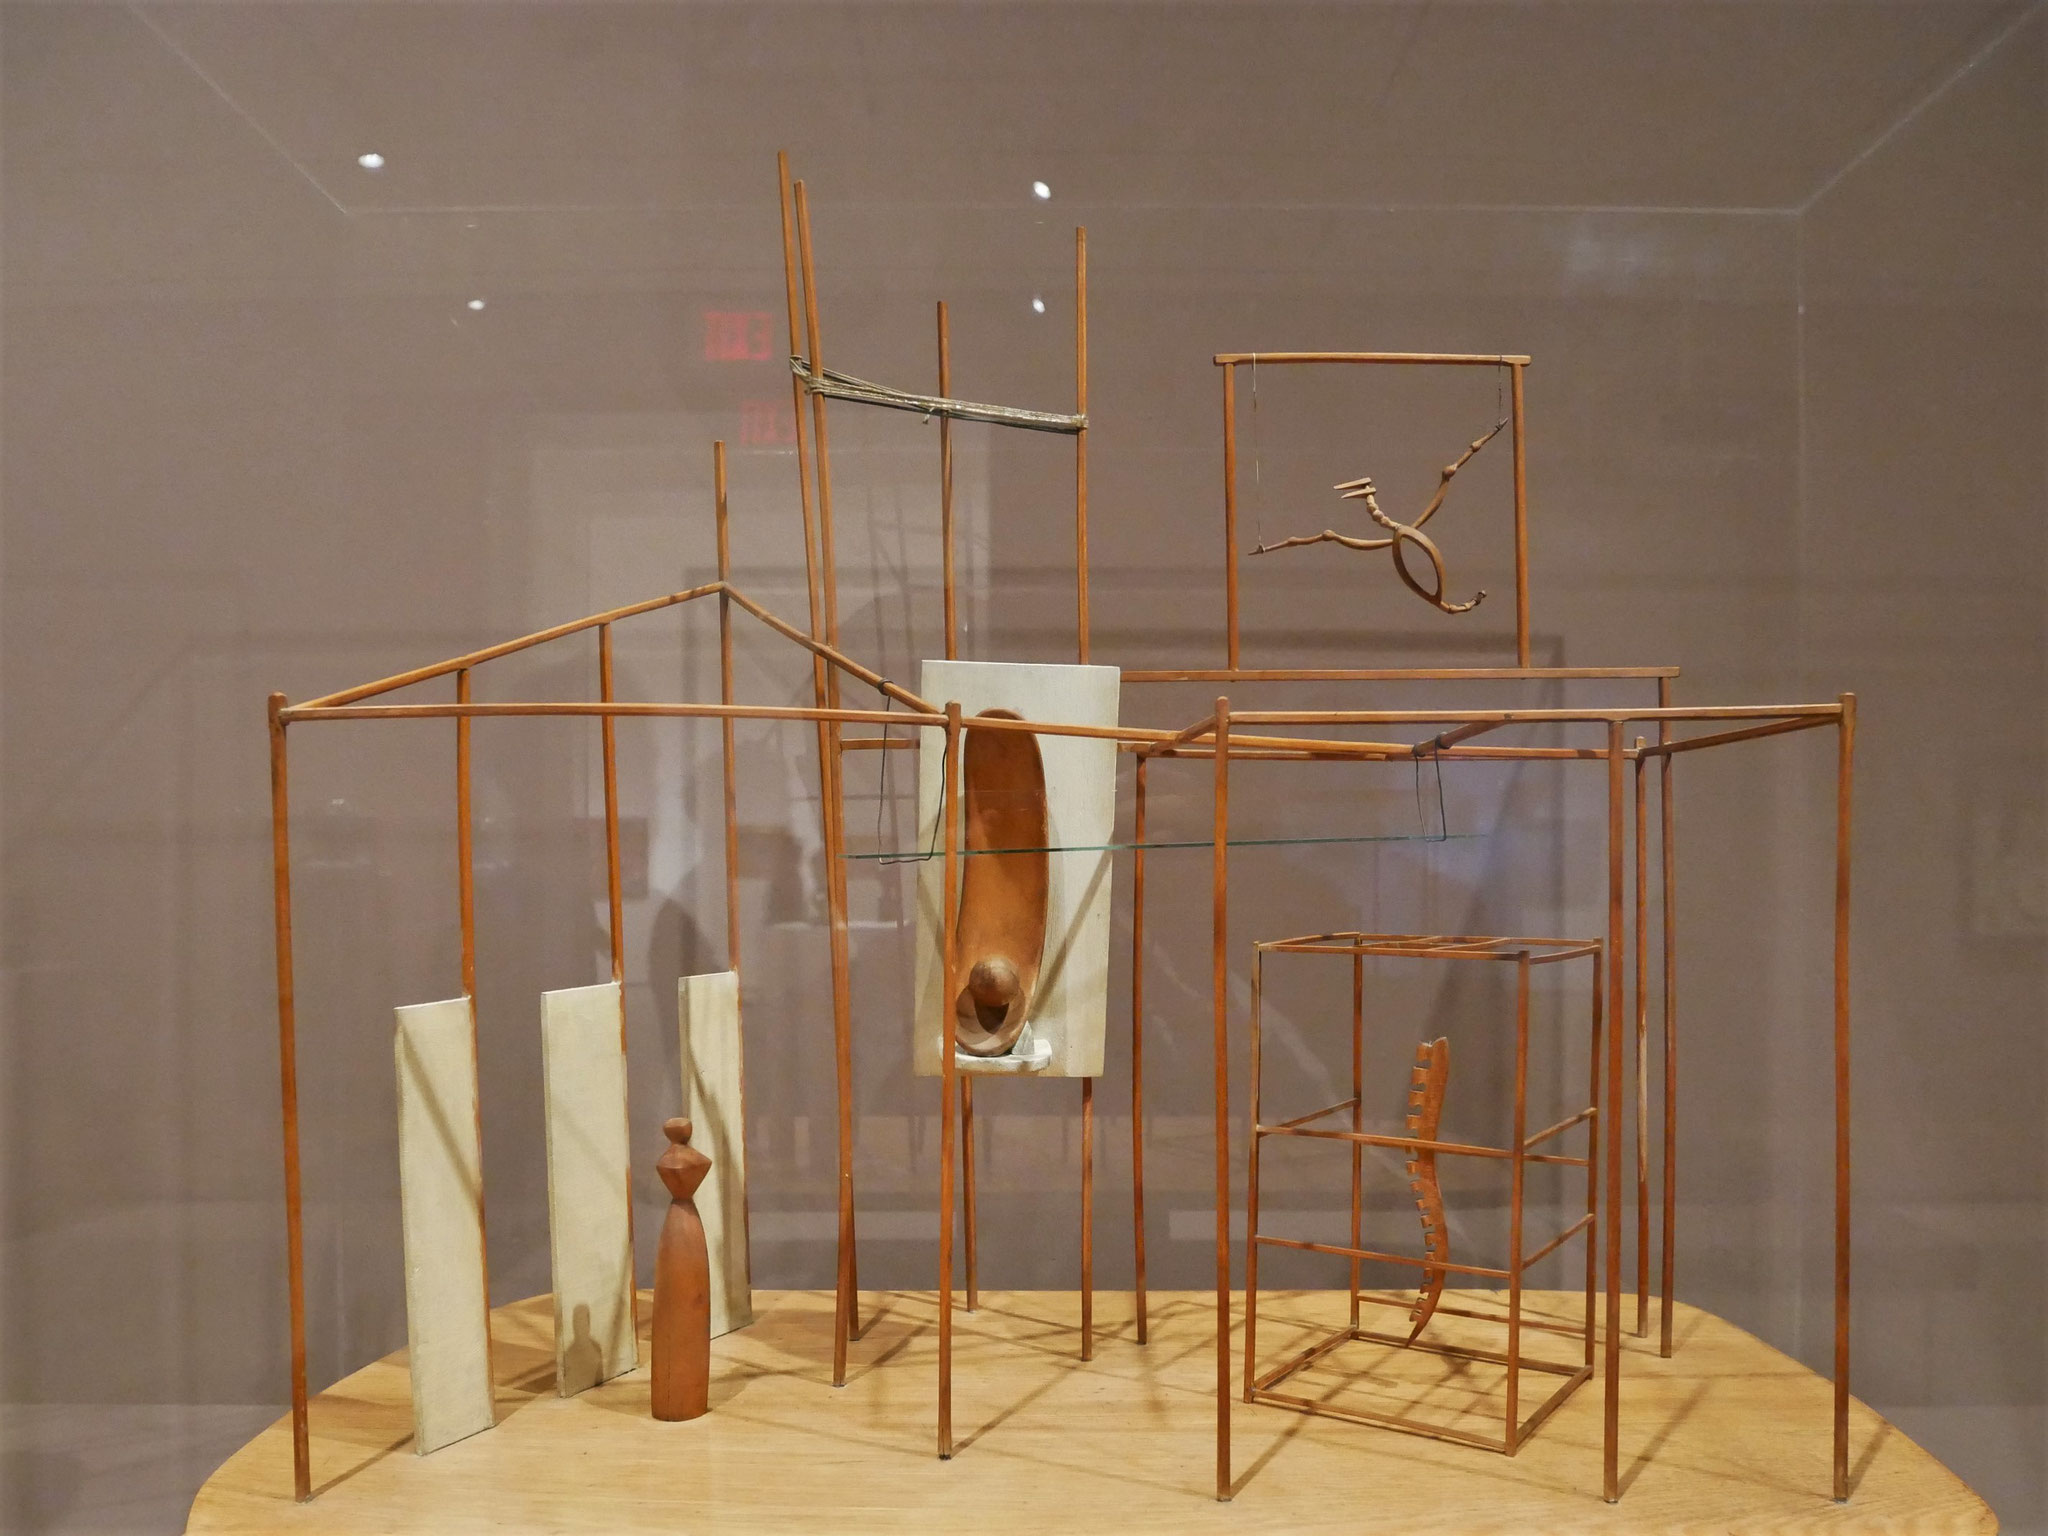 Alberto Giacometti, The Palace at 4 a.m., 1932